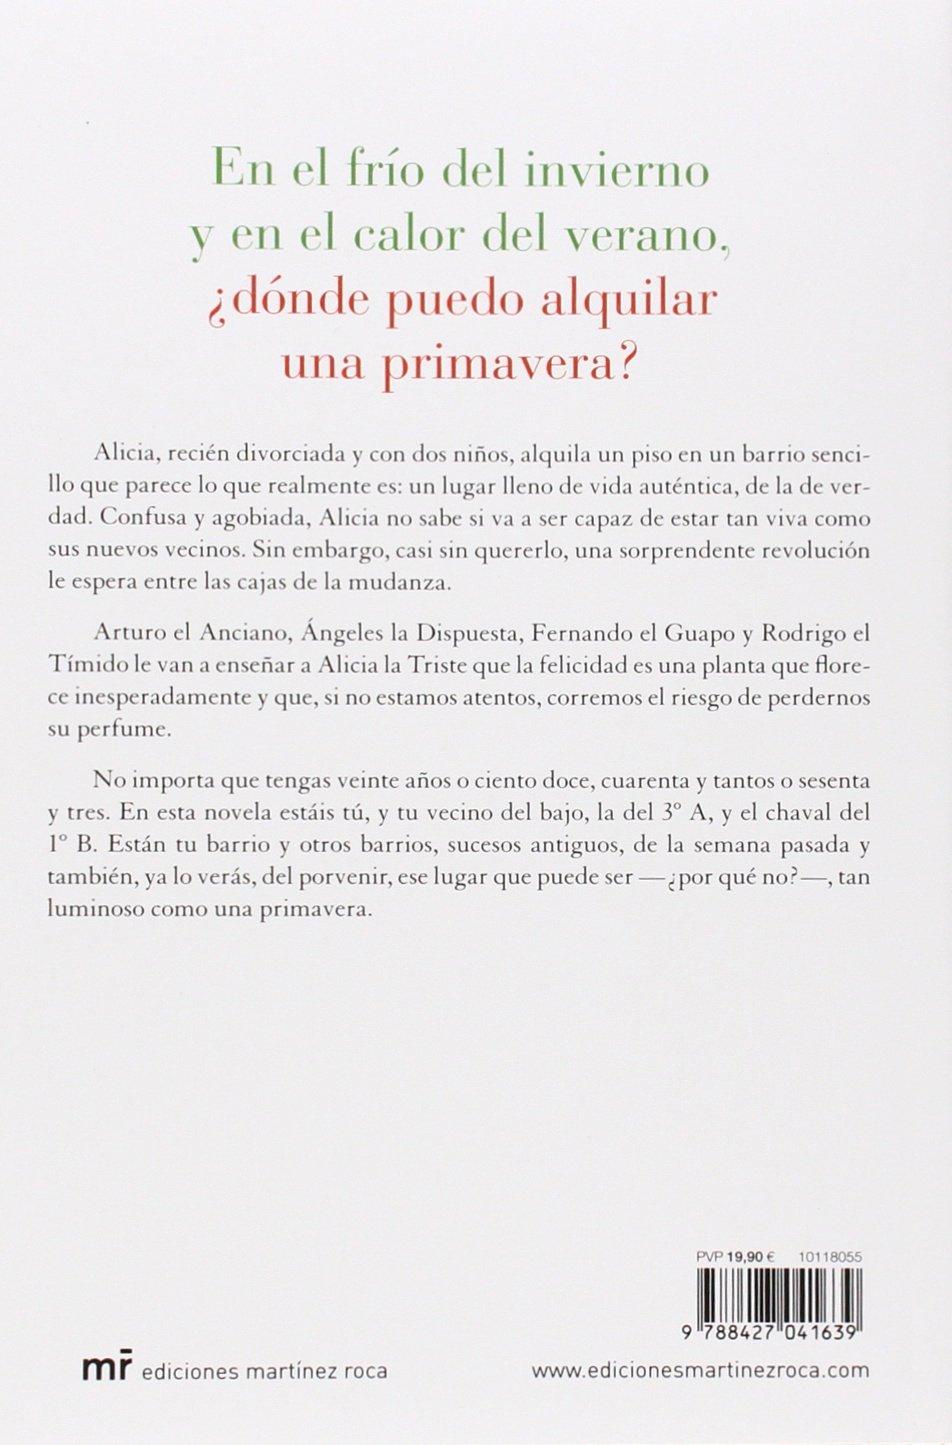 Dónde puedo alquilar una primavera: Silvia Laforet: 9788427041639: Amazon.com: Books